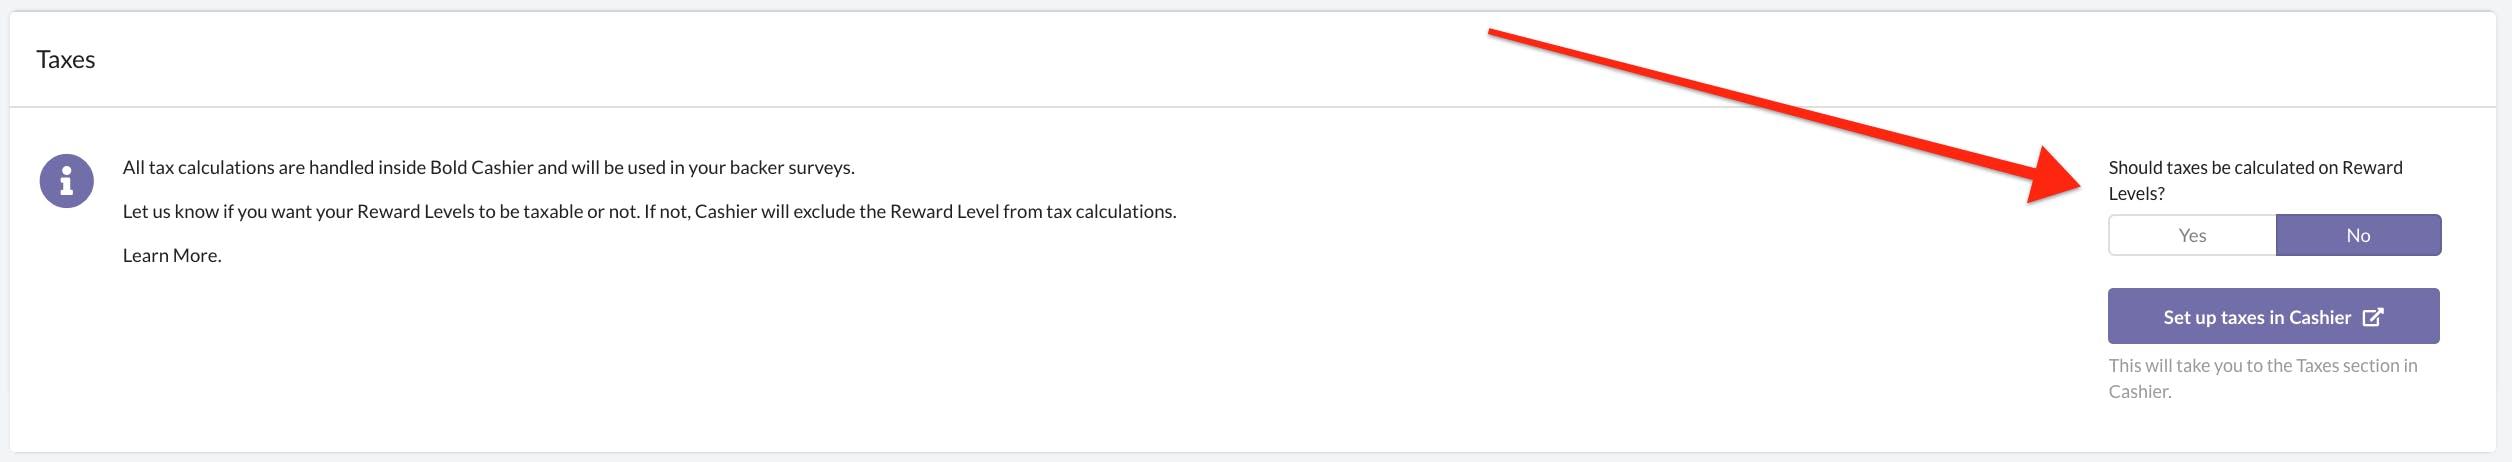 Kickbooster Pledge Manager - taxes on rewards